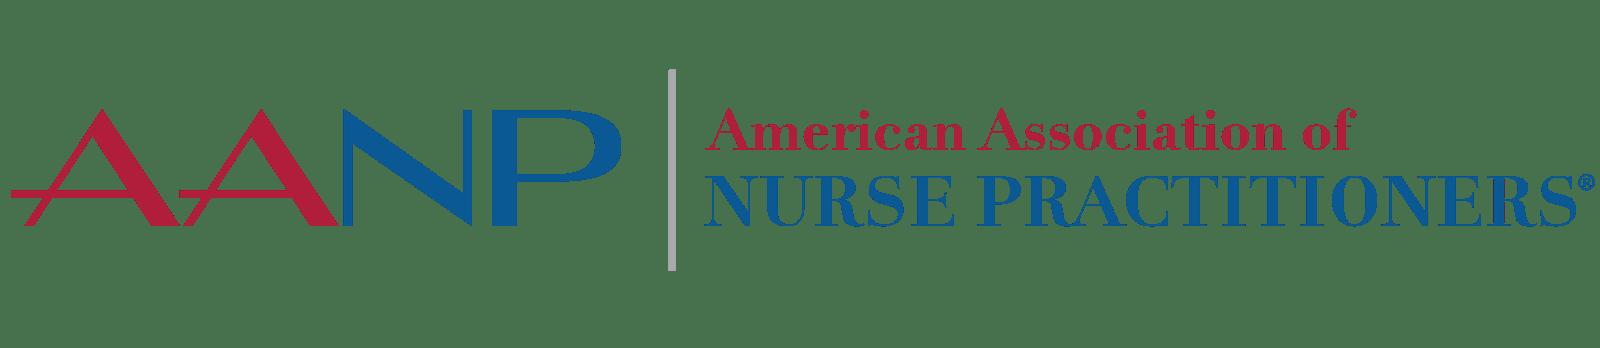 AANP Find a Nurse Practitioner